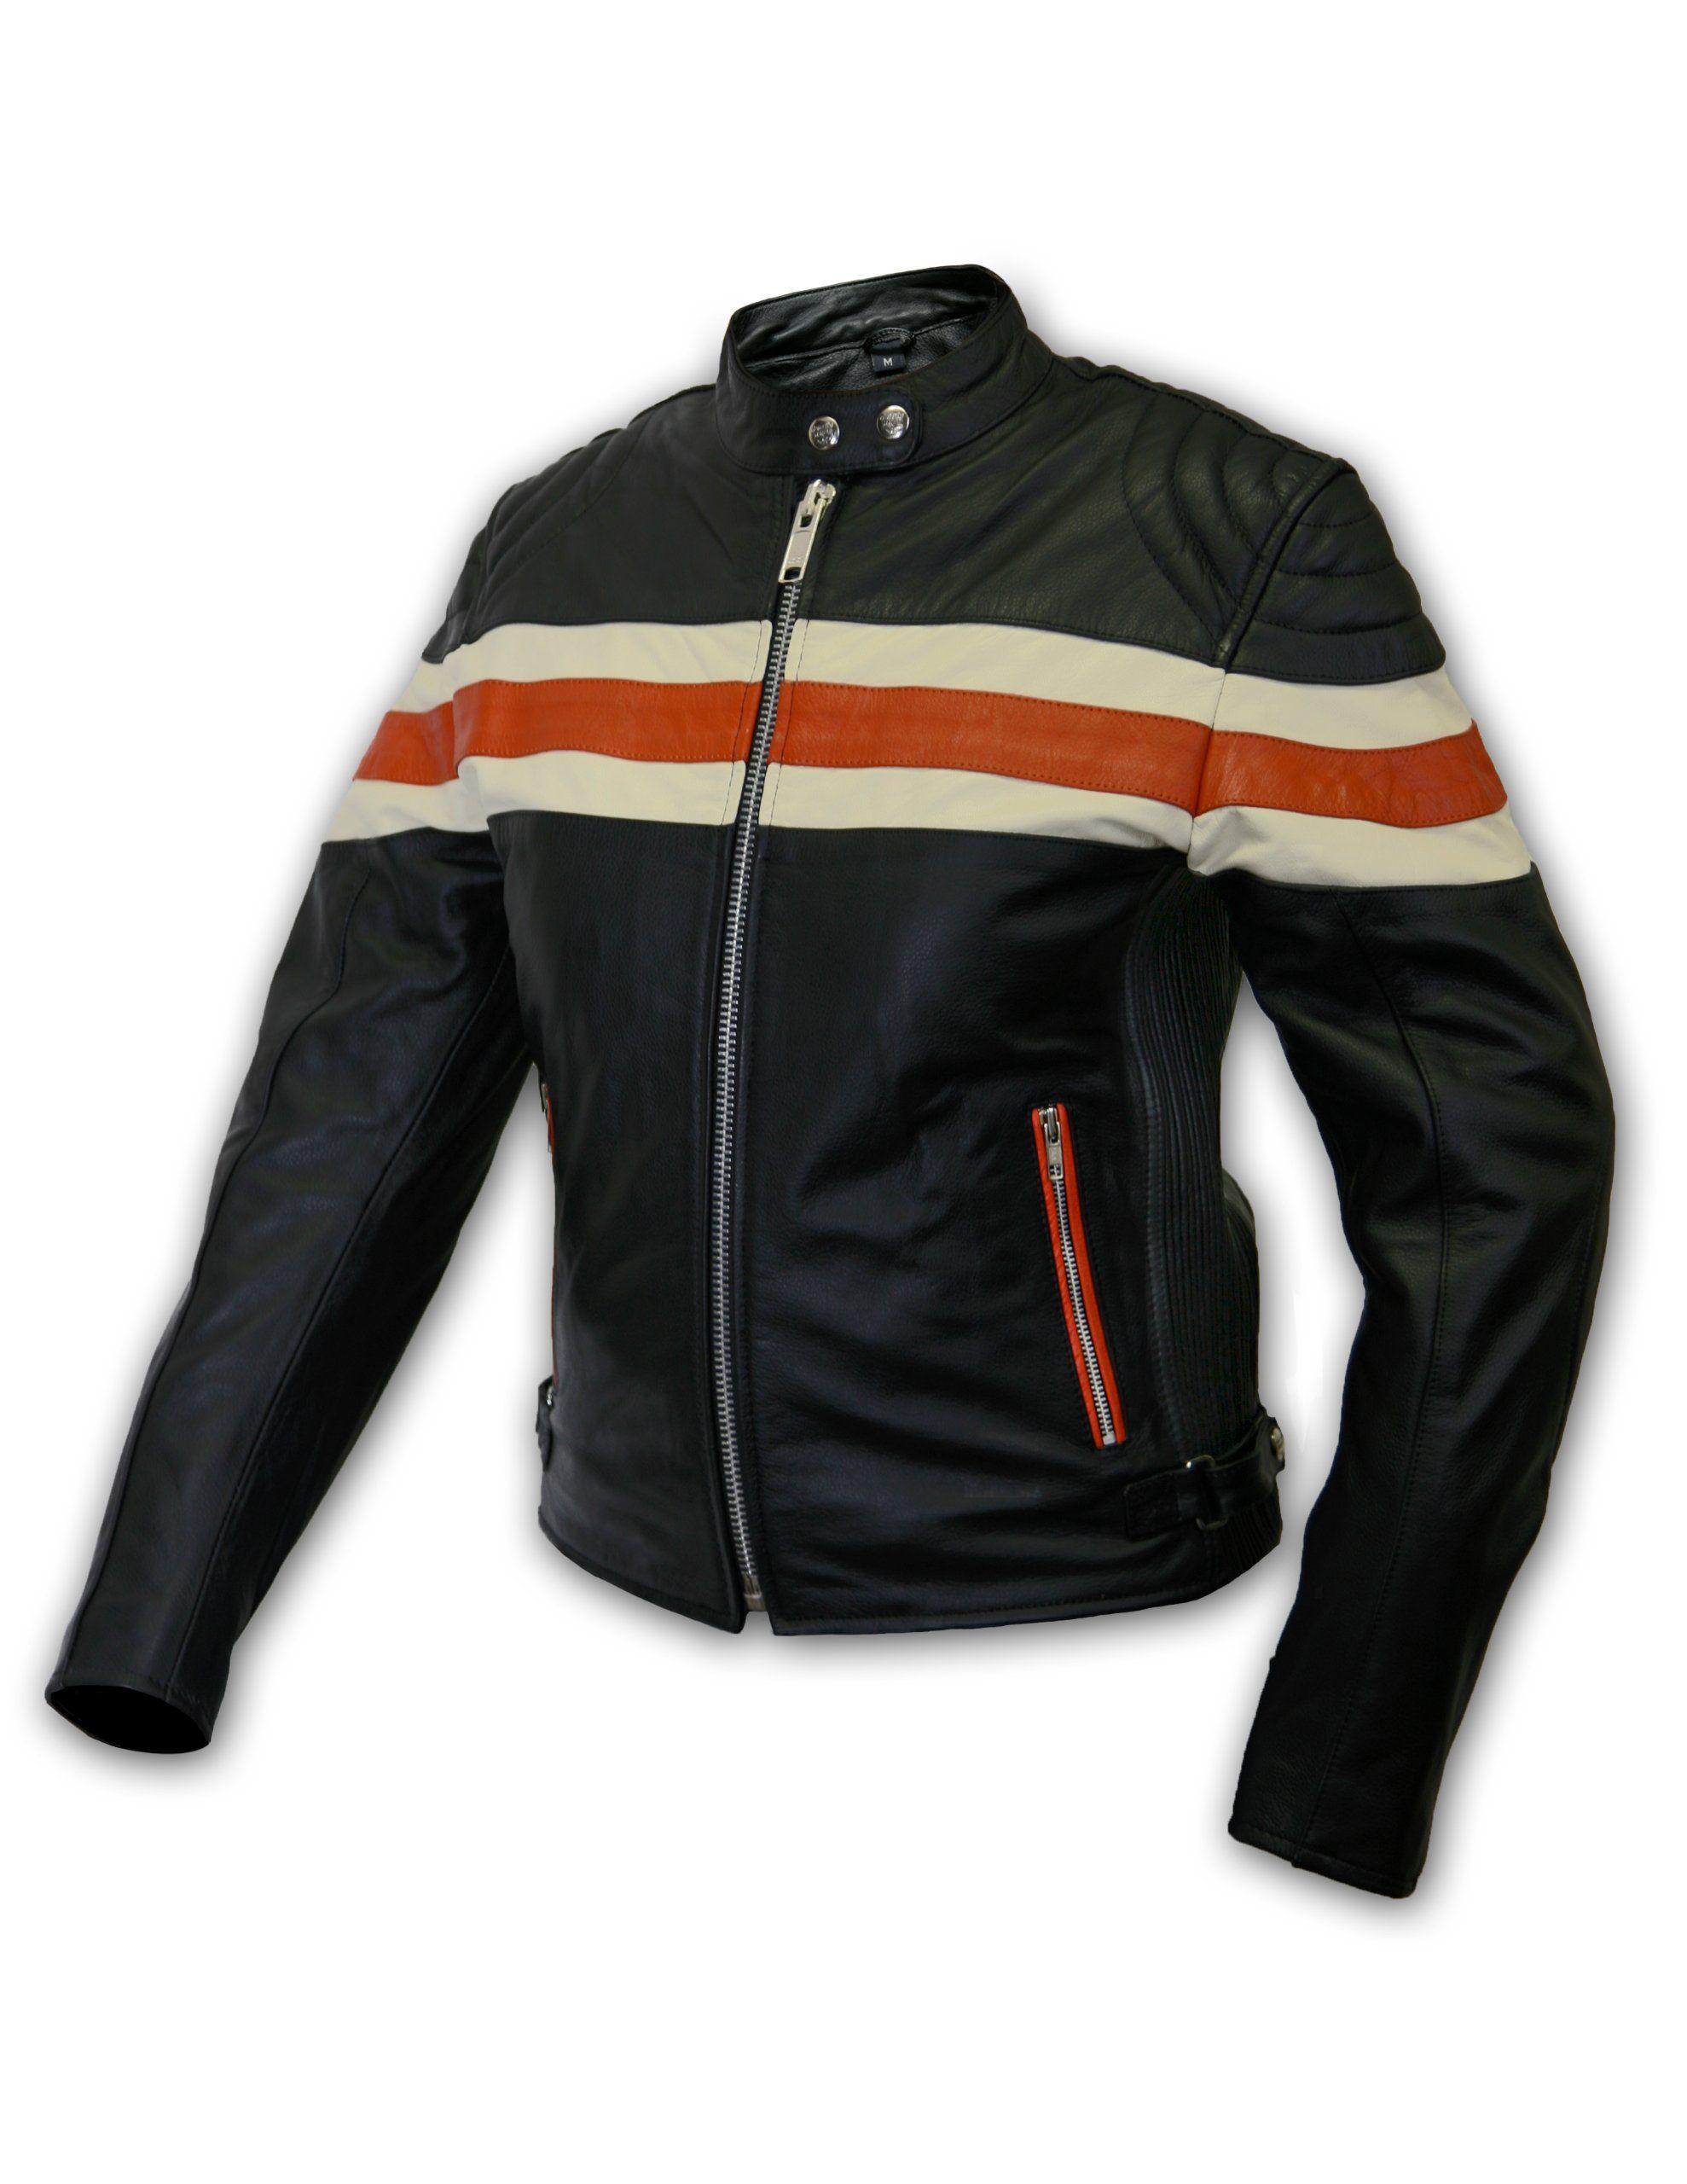 Interstate Leather Ladies Stripe Jacket Black Orange Medium Leather Motorcycle Jacket Women Striped Leather Jacket Striped Jacket [ 2560 x 1978 Pixel ]